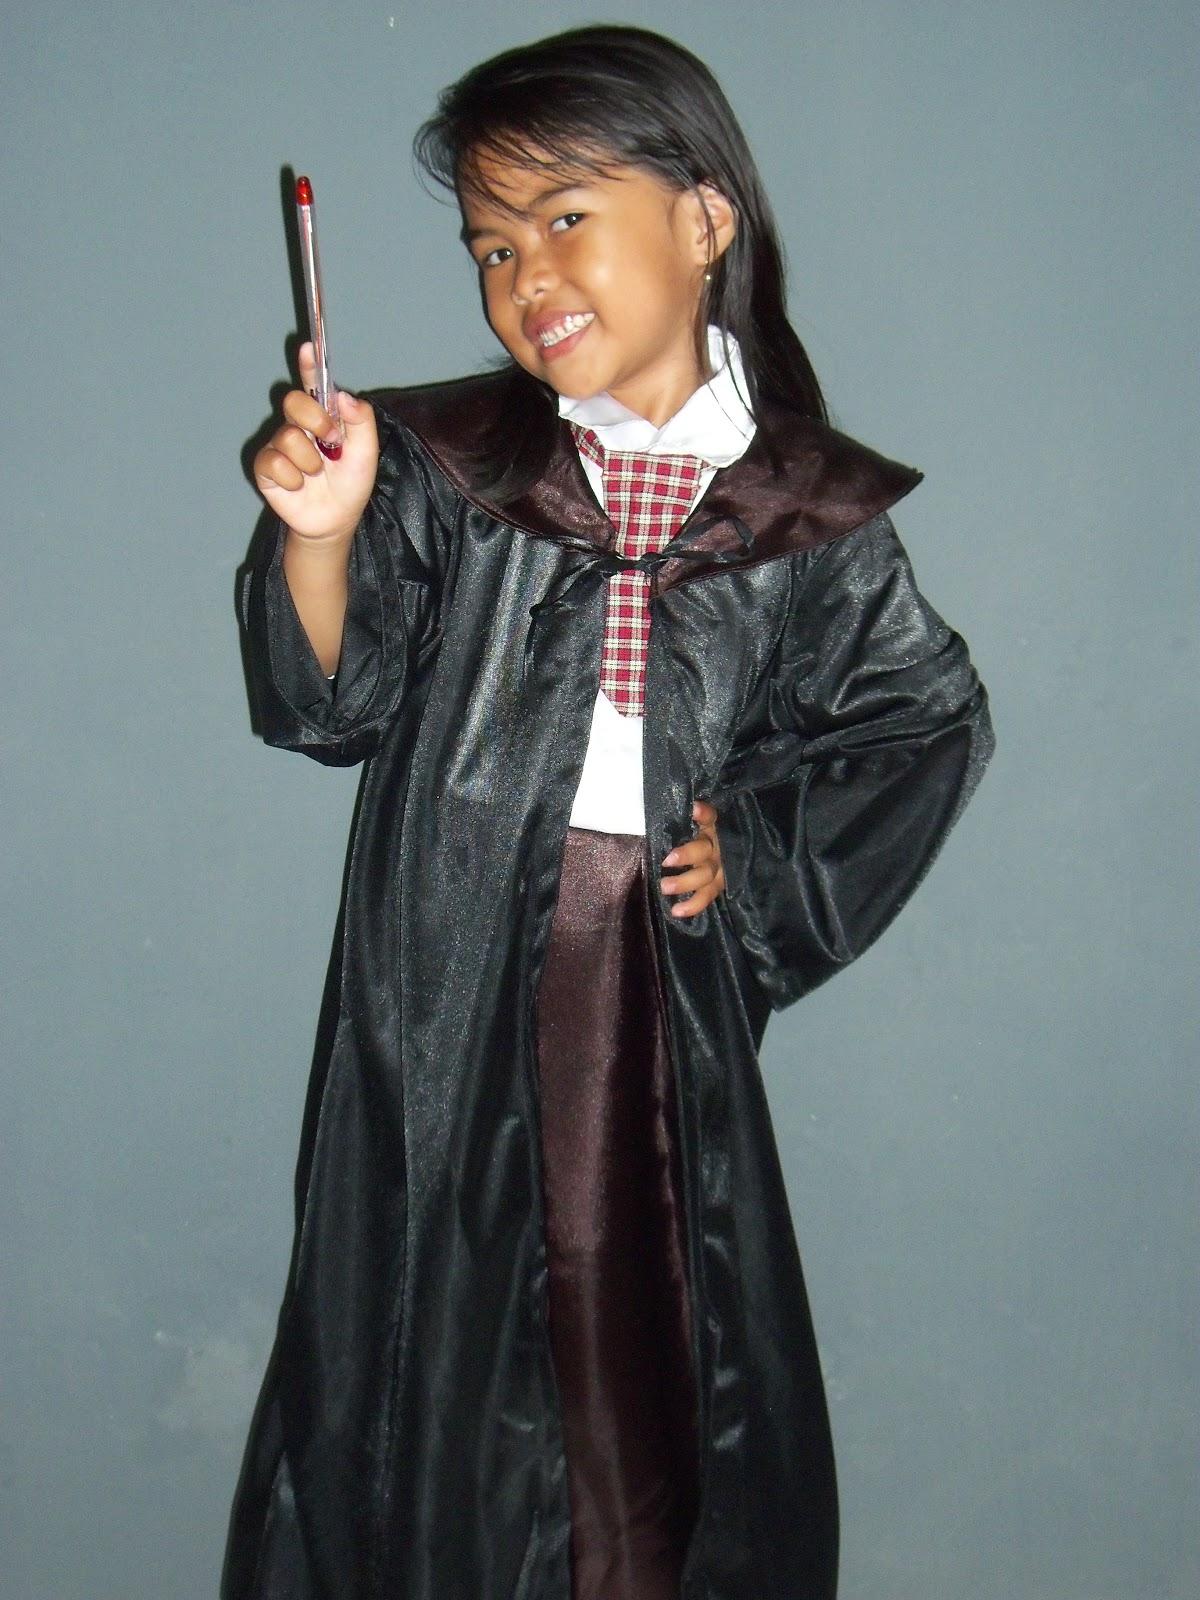 Nama Kostum : Kostum Hermione Ginger (Harry Potter)